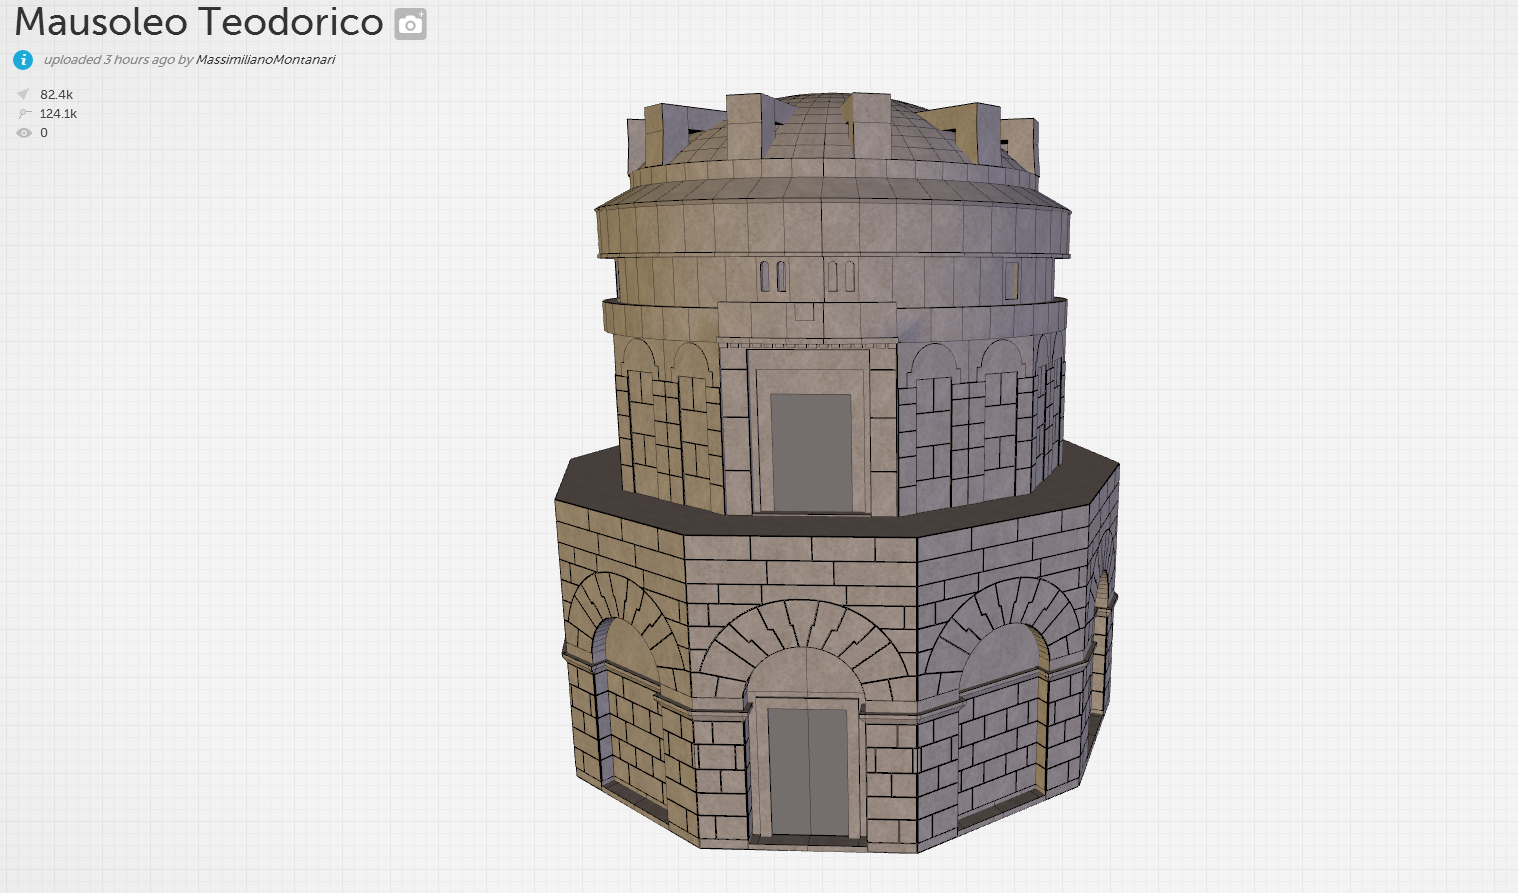 mausoleo teodorico 3d